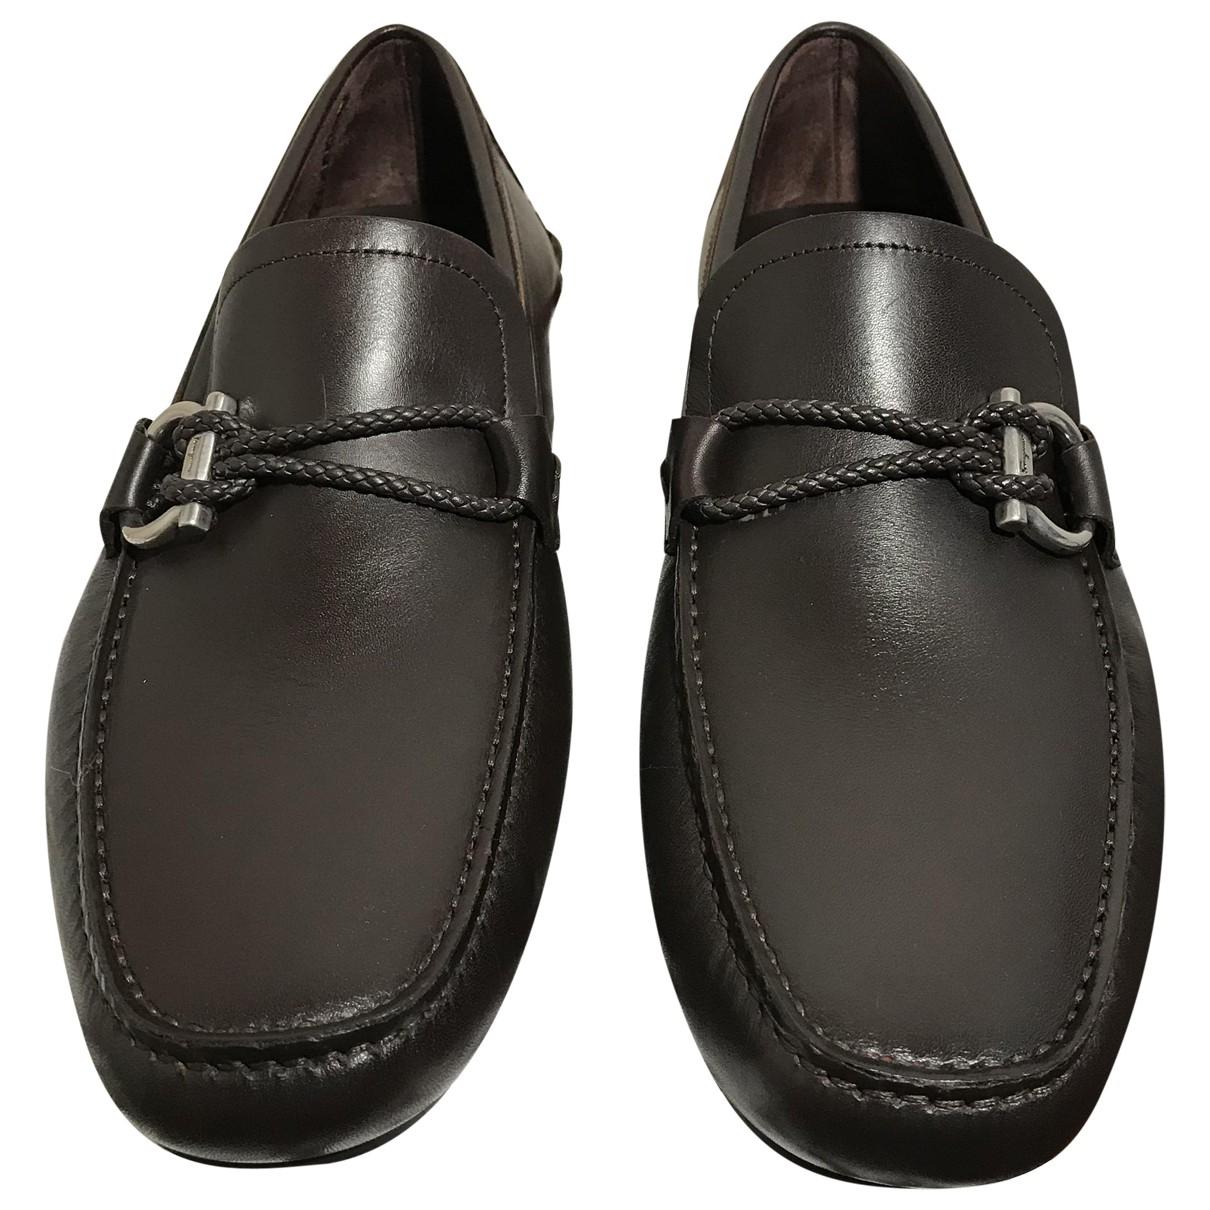 Salvatore Ferragamo N Brown Leather Flats for Men 8.5 US